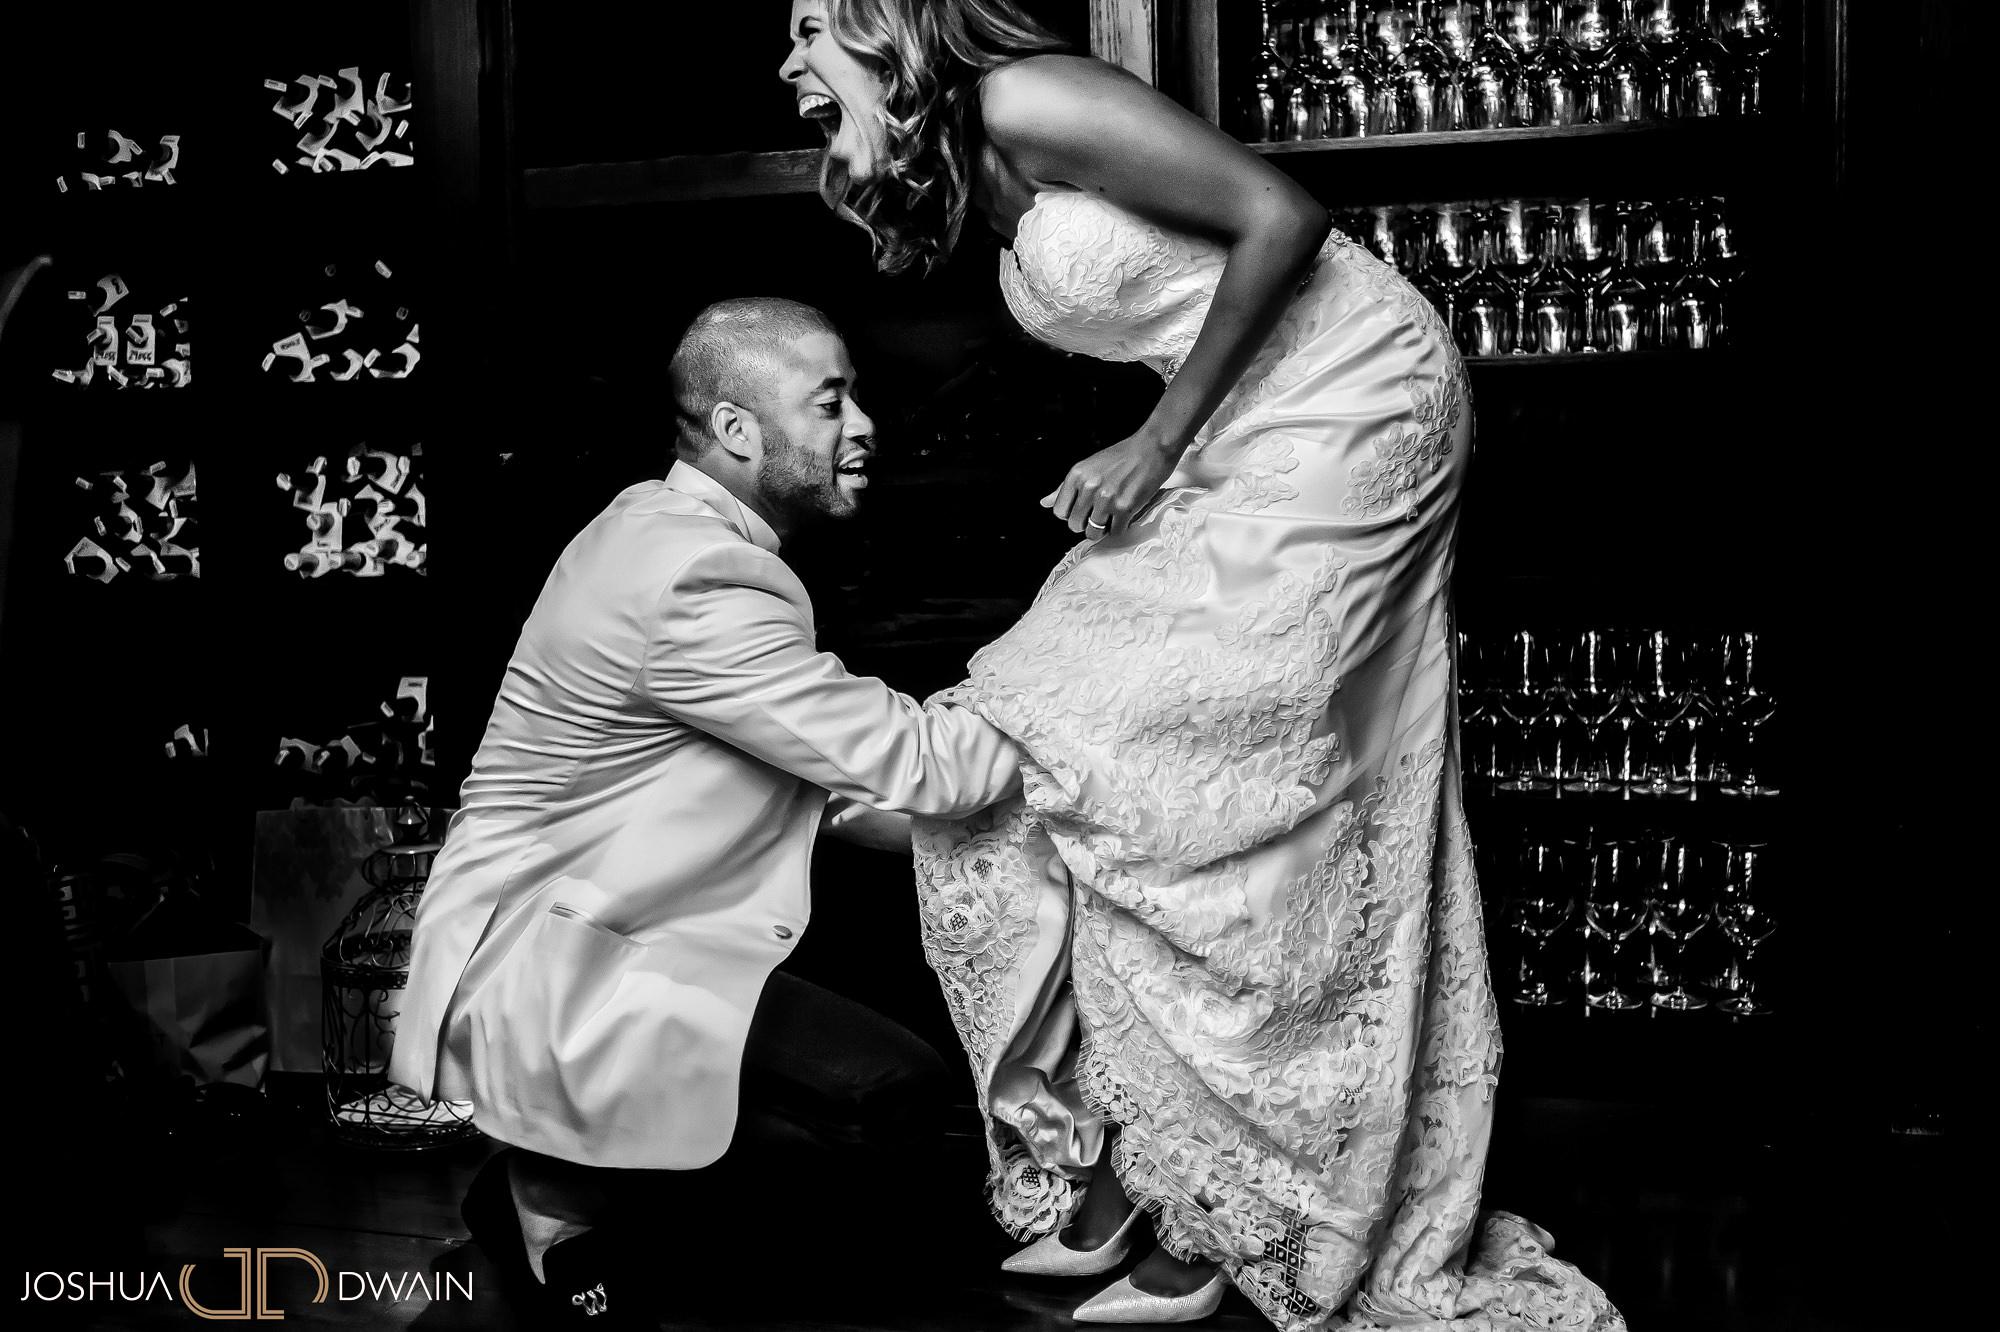 joshua-dwain-weddings-gallery-best-wedding-photographers-us-058